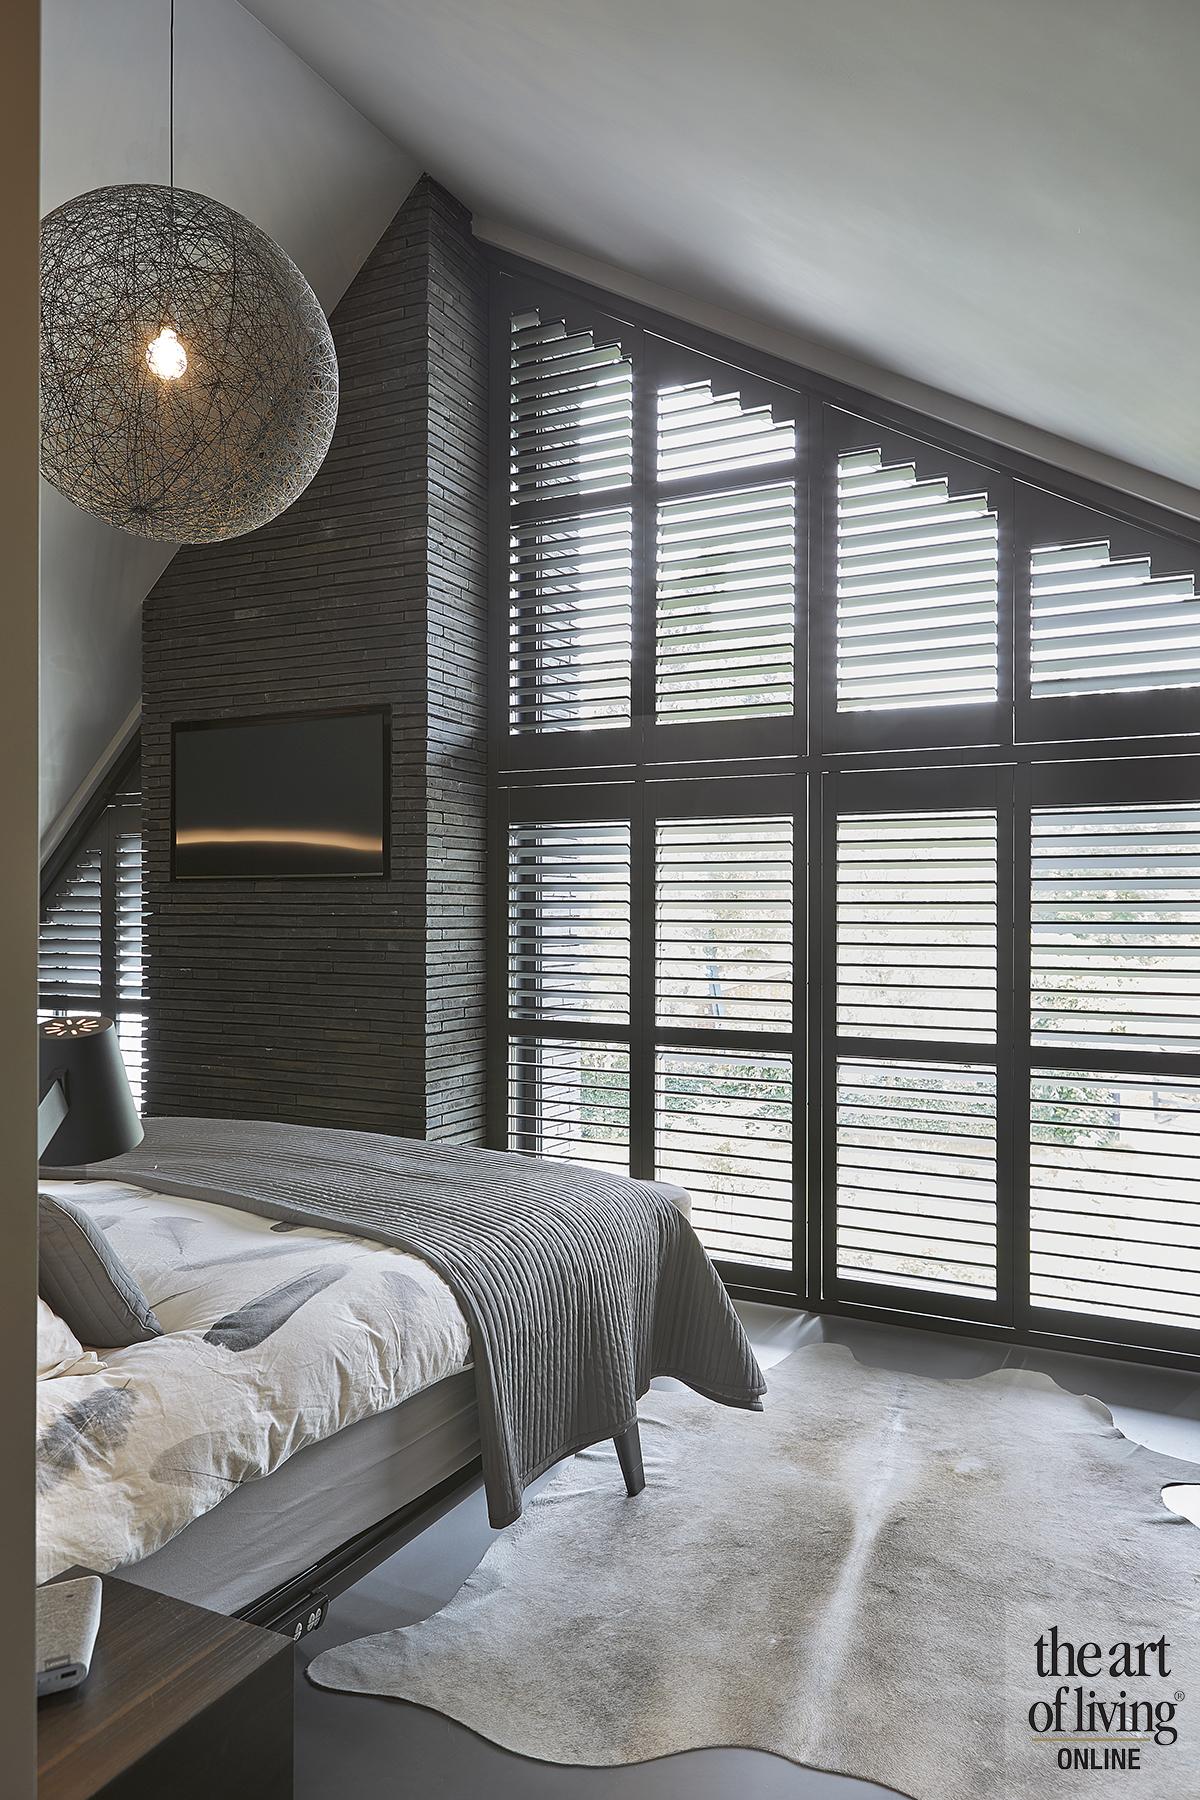 Warm interieur, Kees Marcelis, the art of living